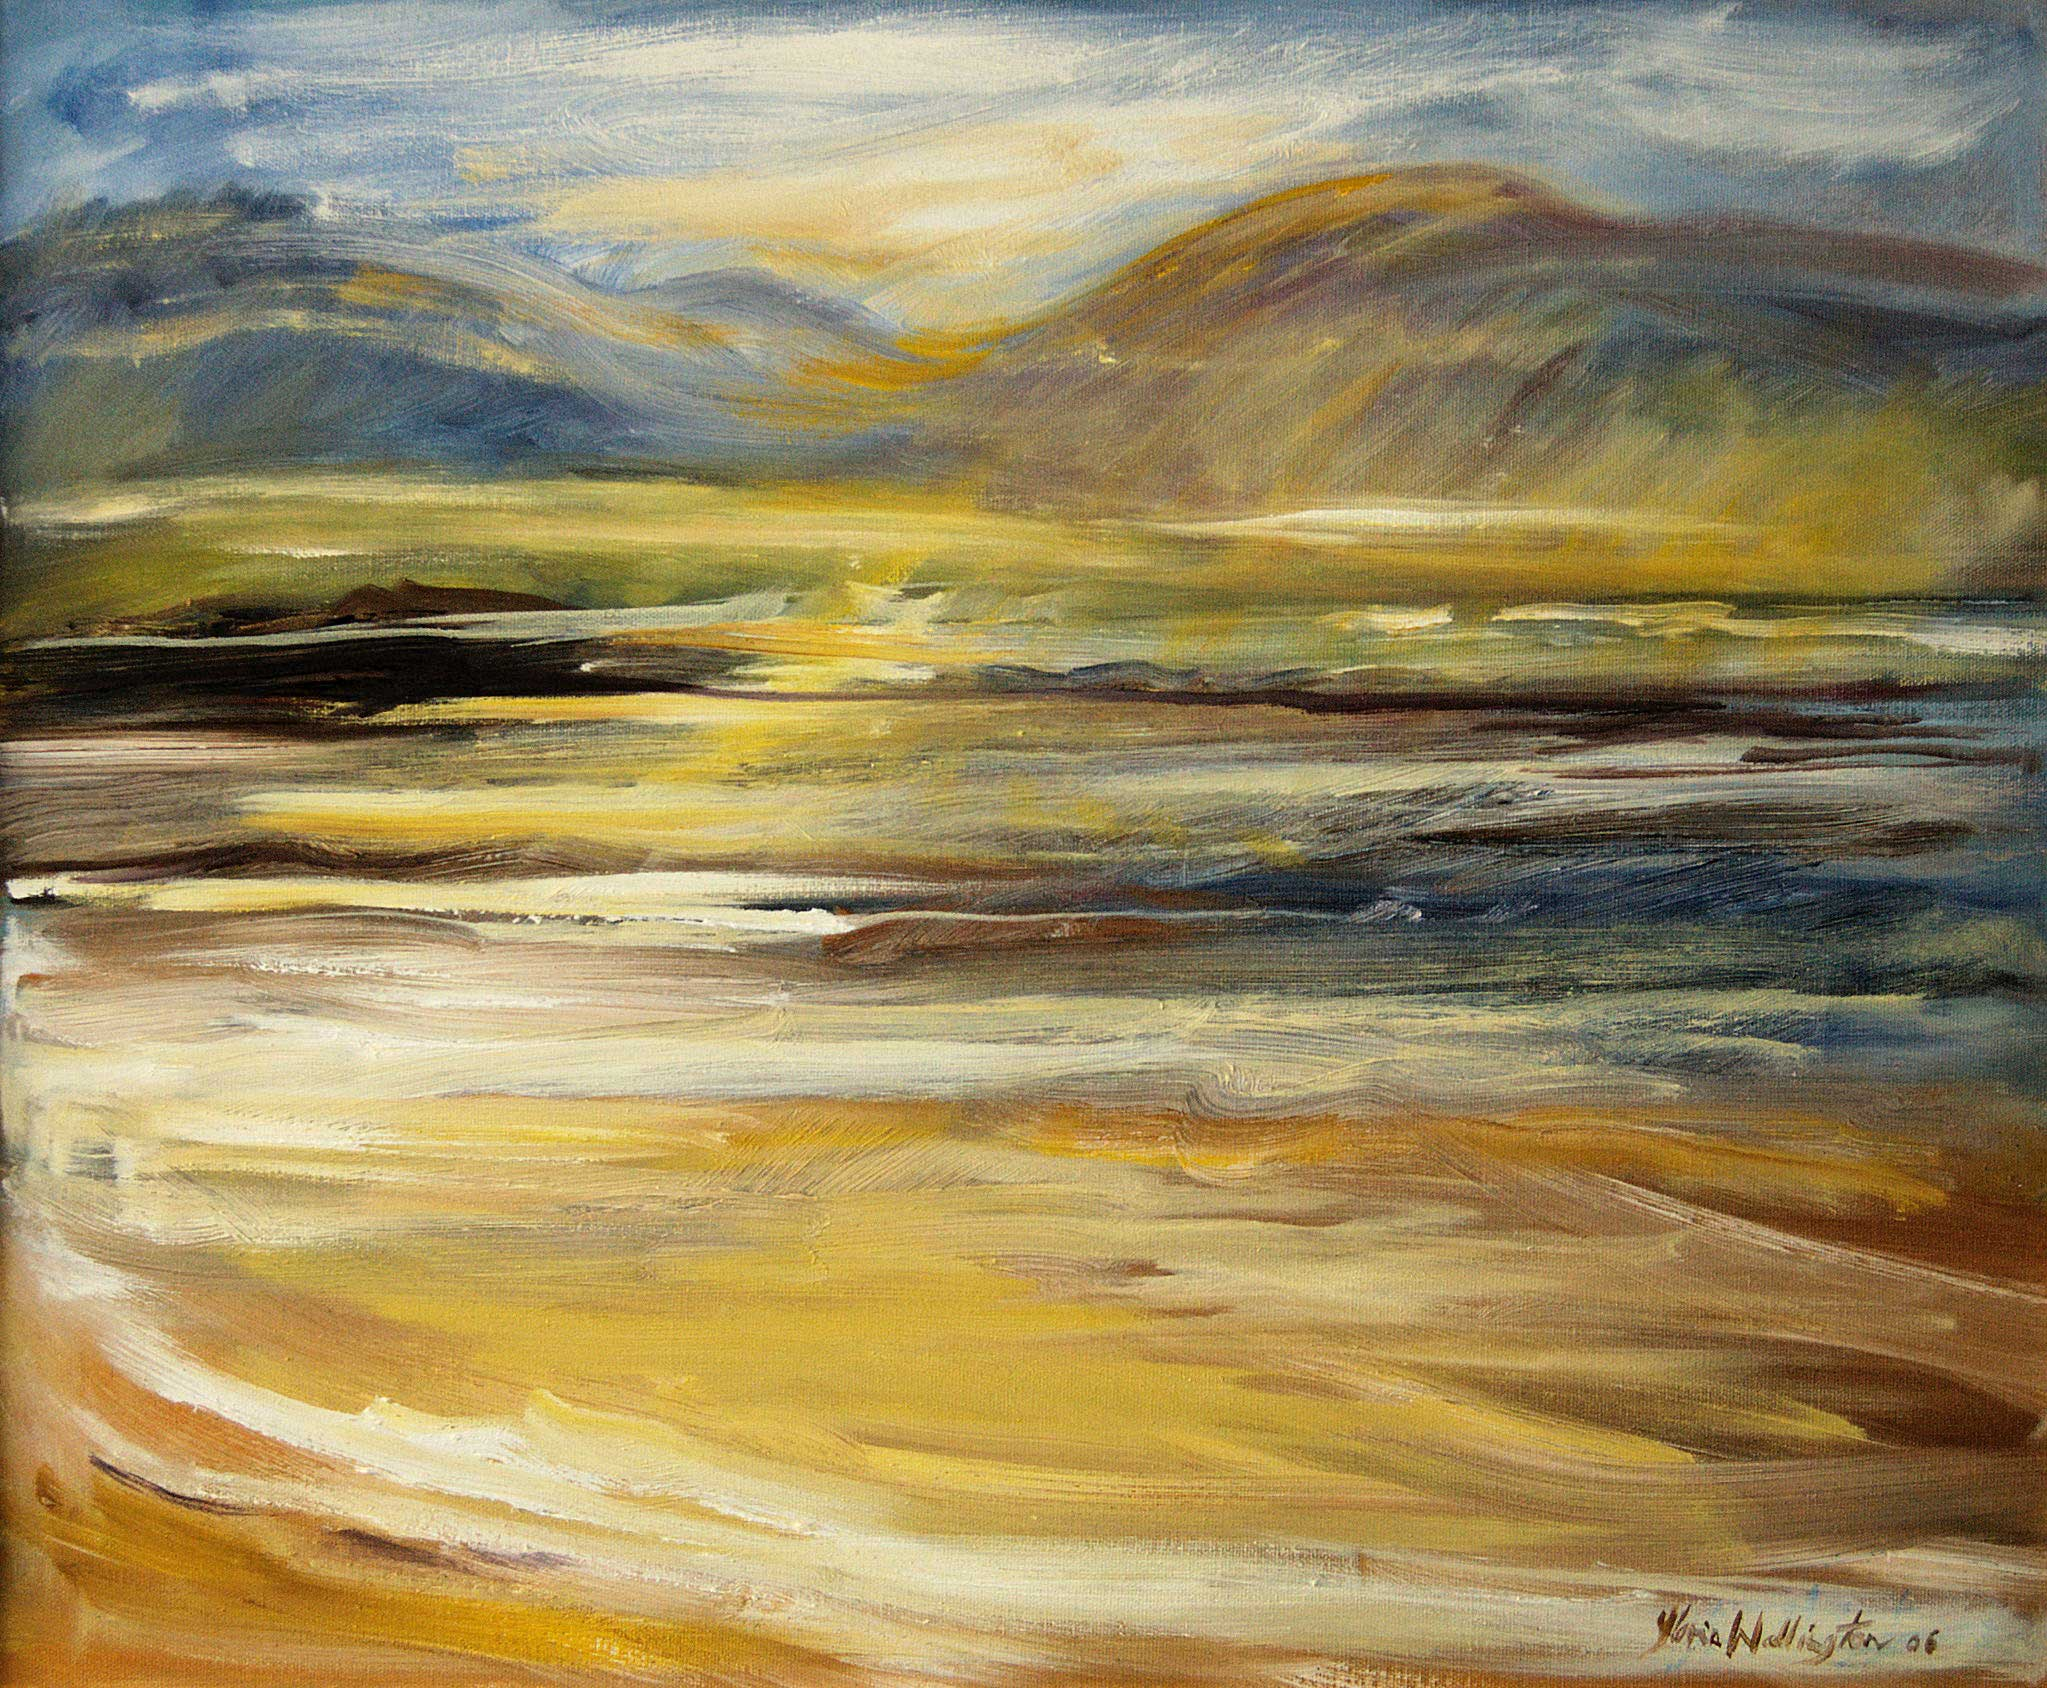 Gloria Wallington, Sand, Sea and Hill, 2016. © the artist